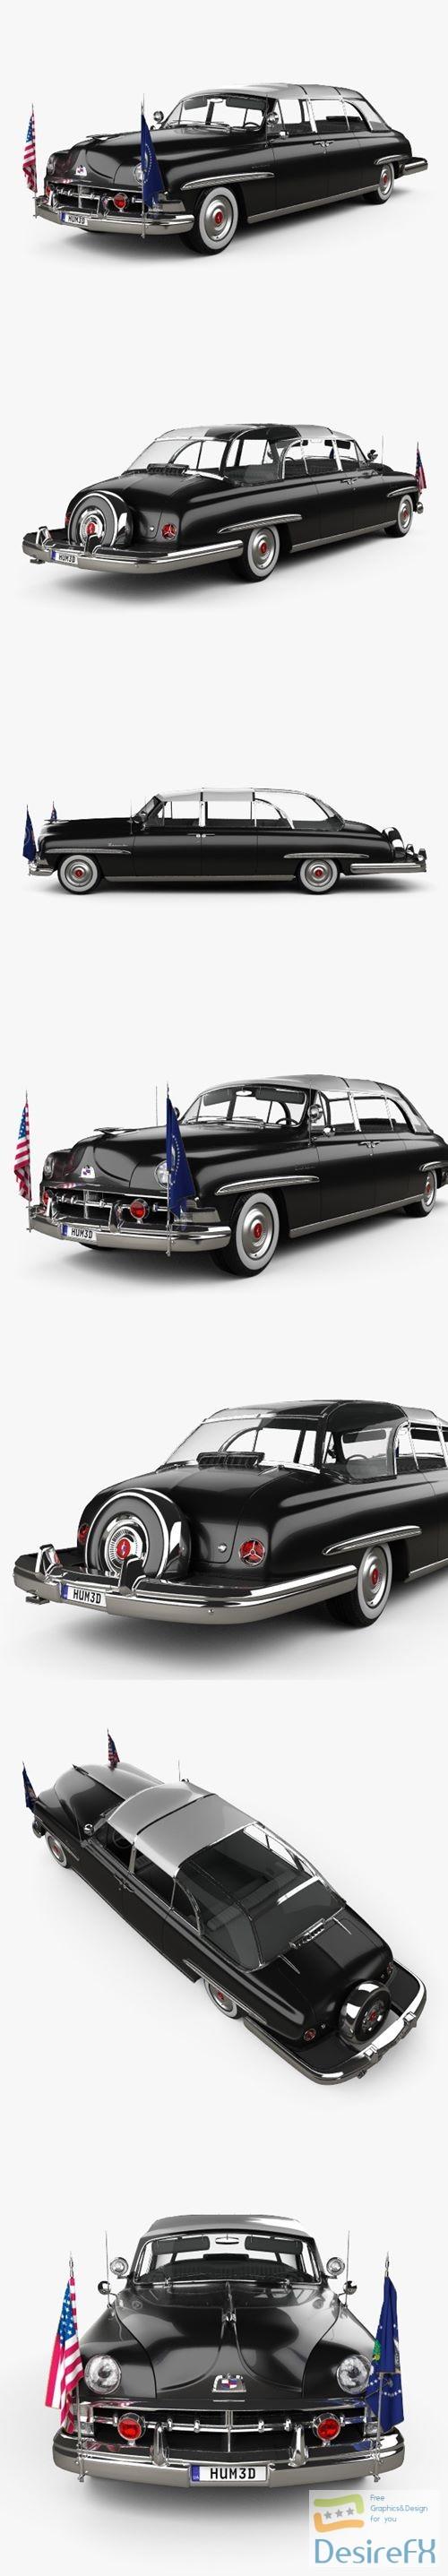 3d-models - Lincoln Cosmopolitan Presidential Limousine 1950 3D Model